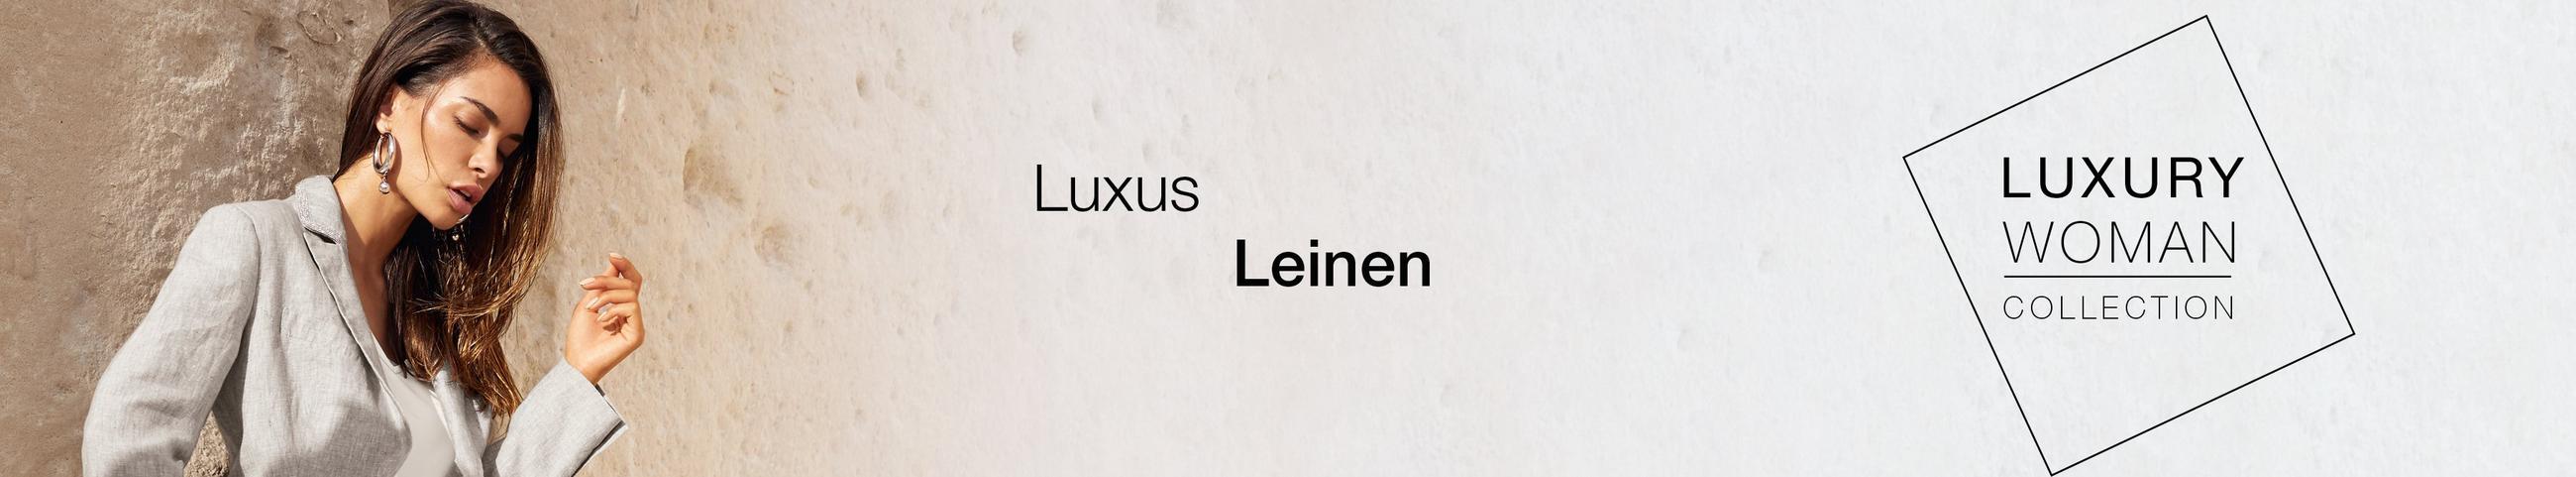 20191204_CC_Luxus_Premium_expand_Deko_Leinen_D.jpg